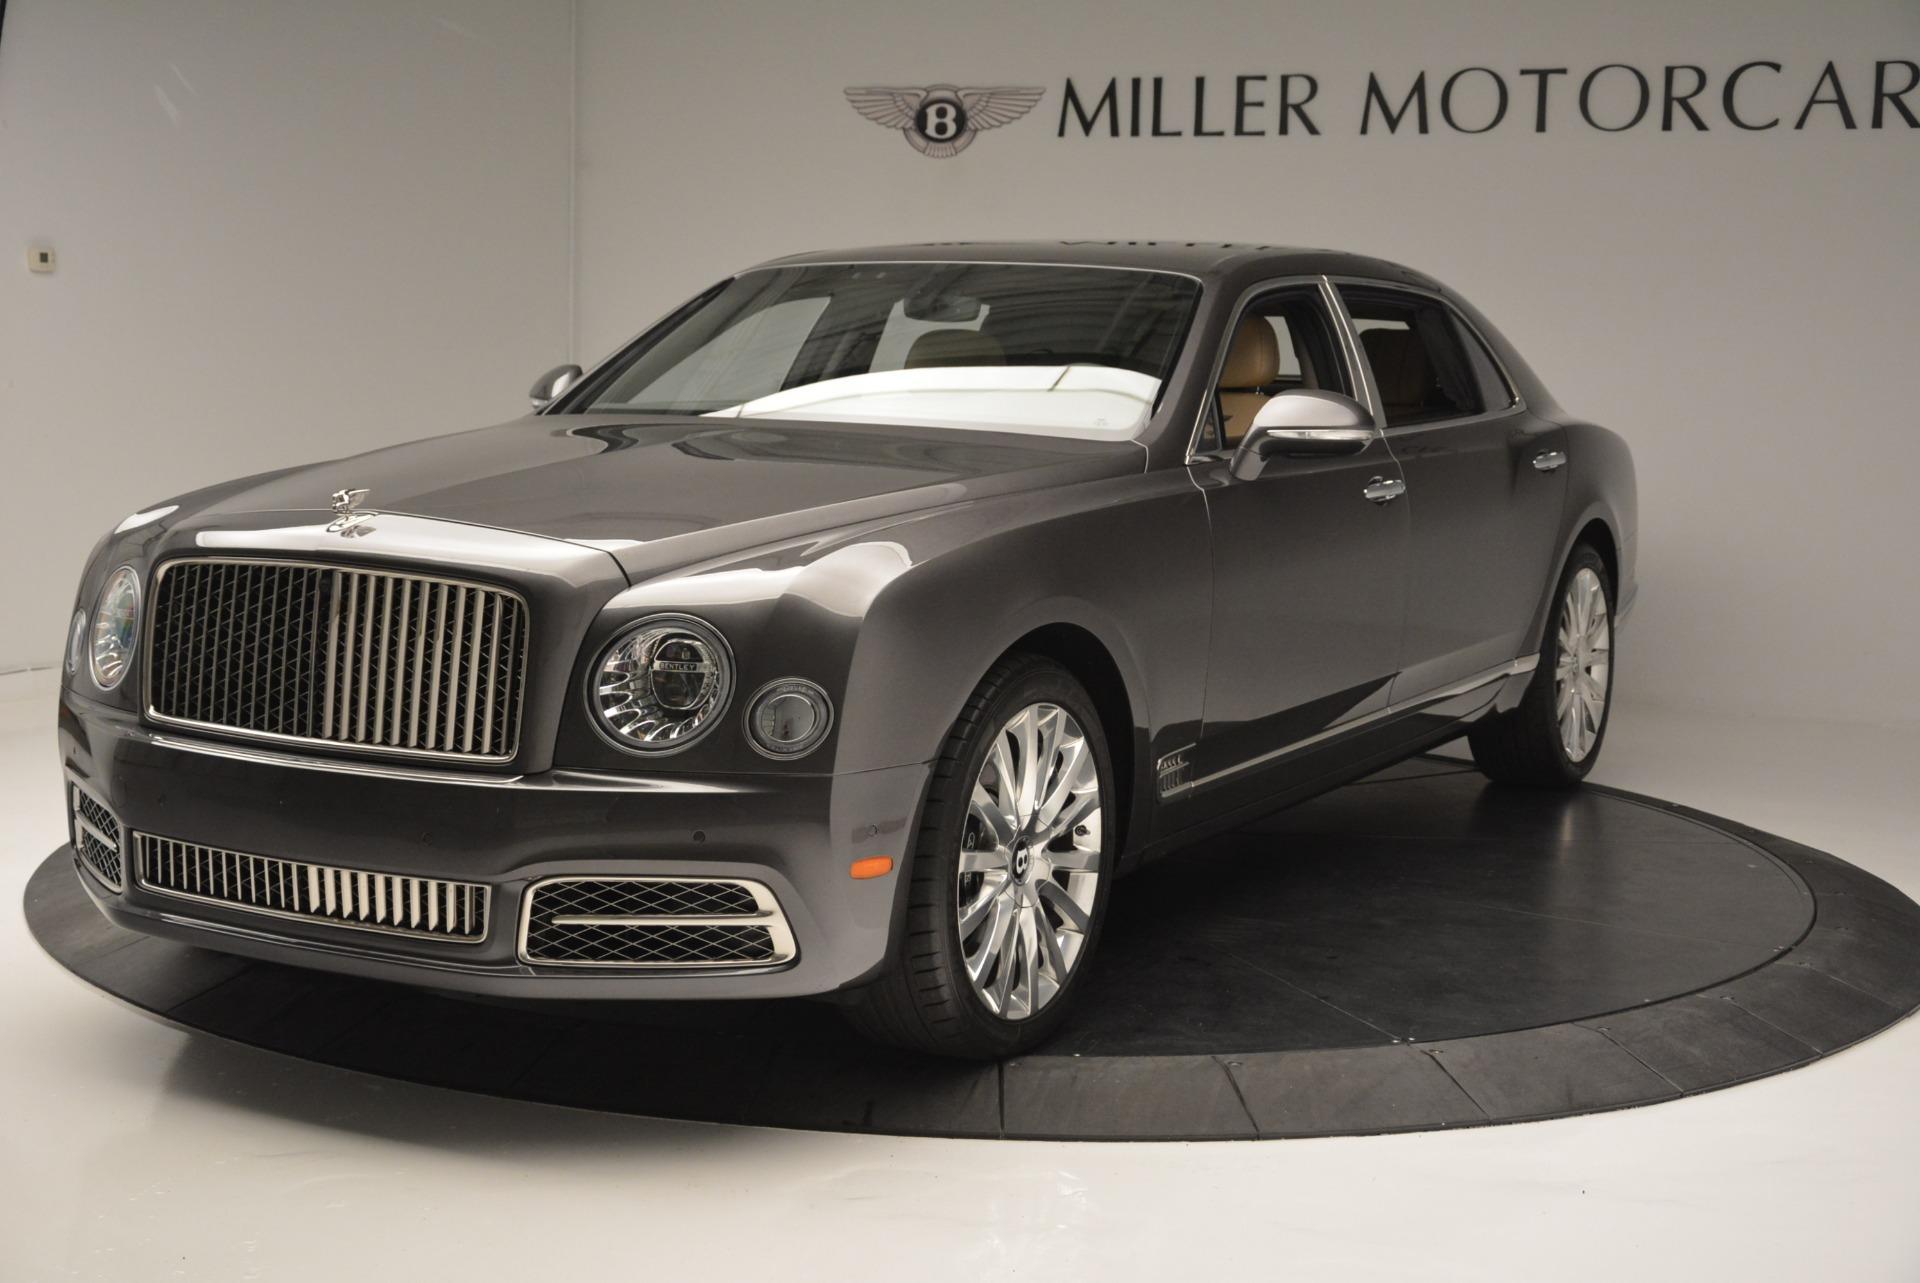 Used 2017 Bentley Mulsanne EWB for sale Sold at Rolls-Royce Motor Cars Greenwich in Greenwich CT 06830 1